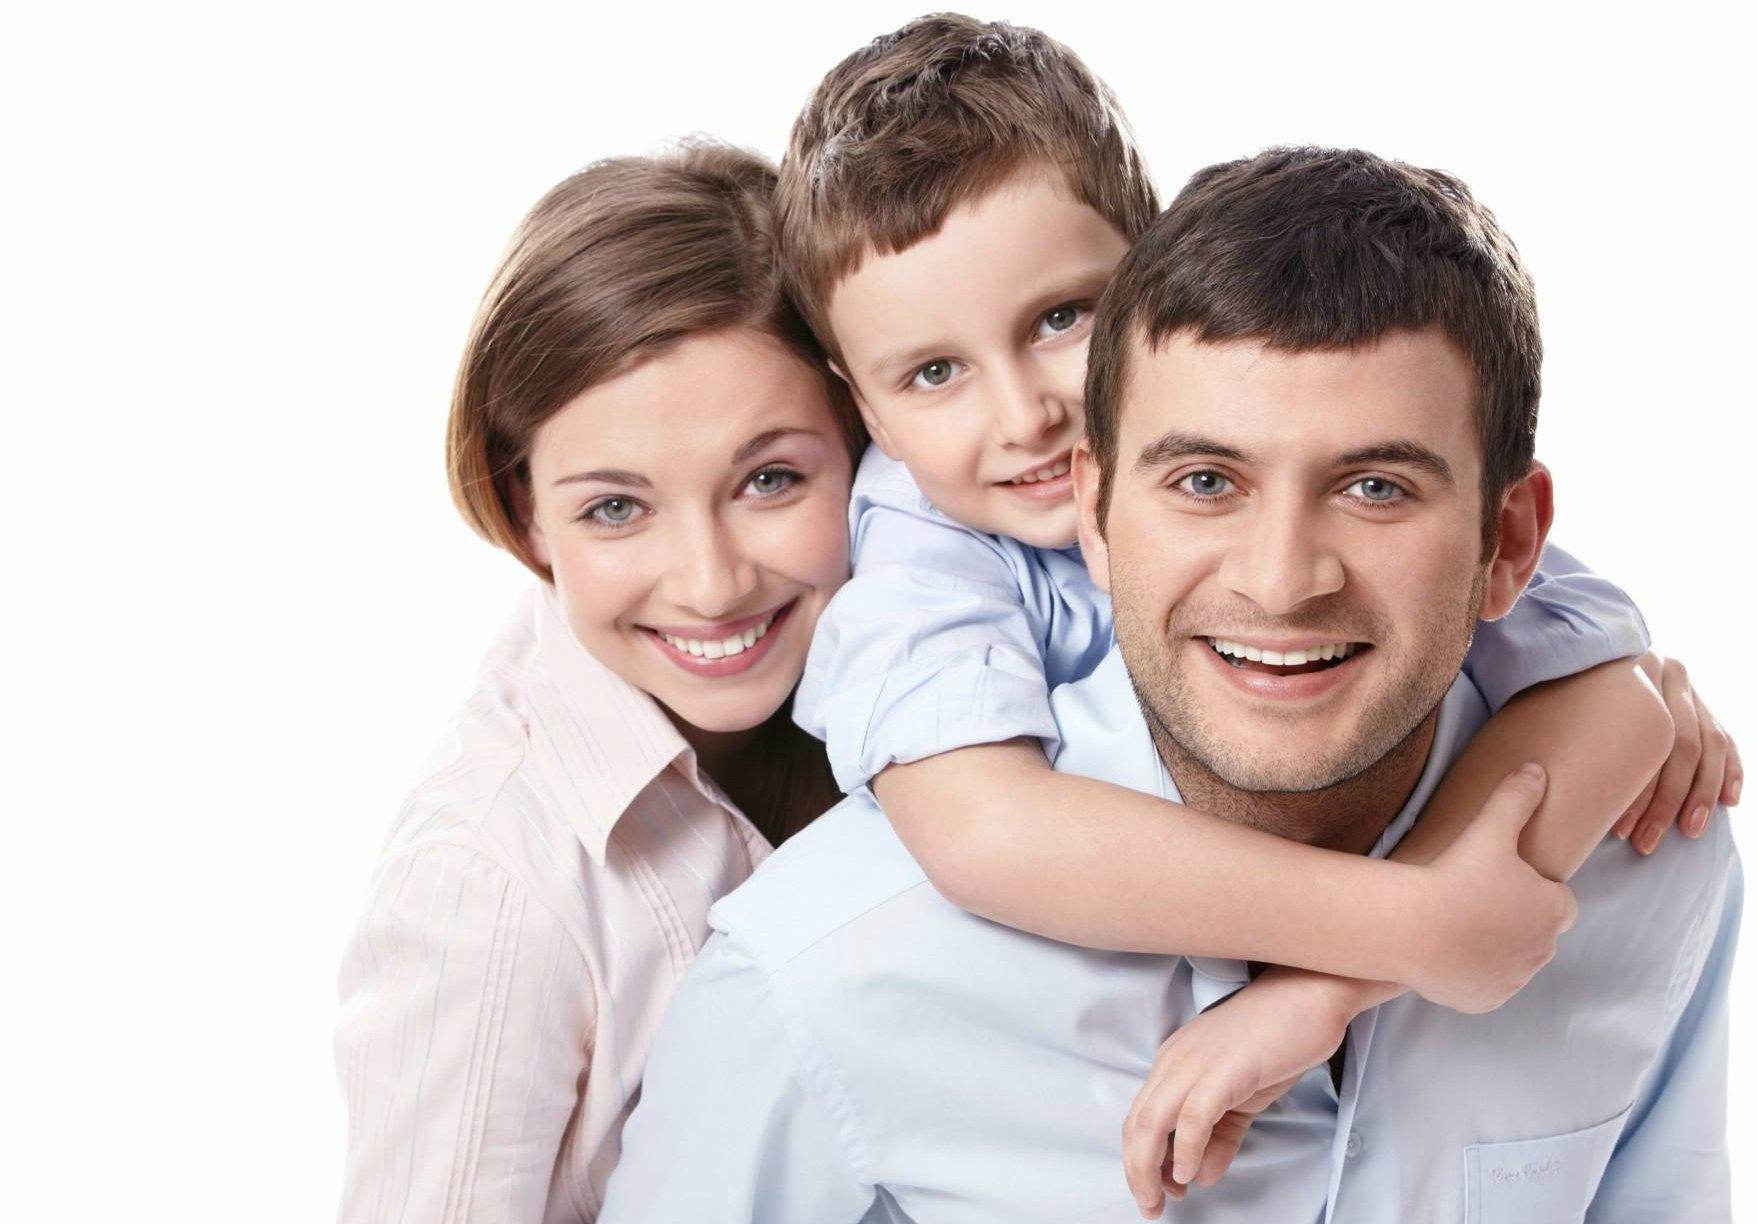 speciale famiglie boario terme